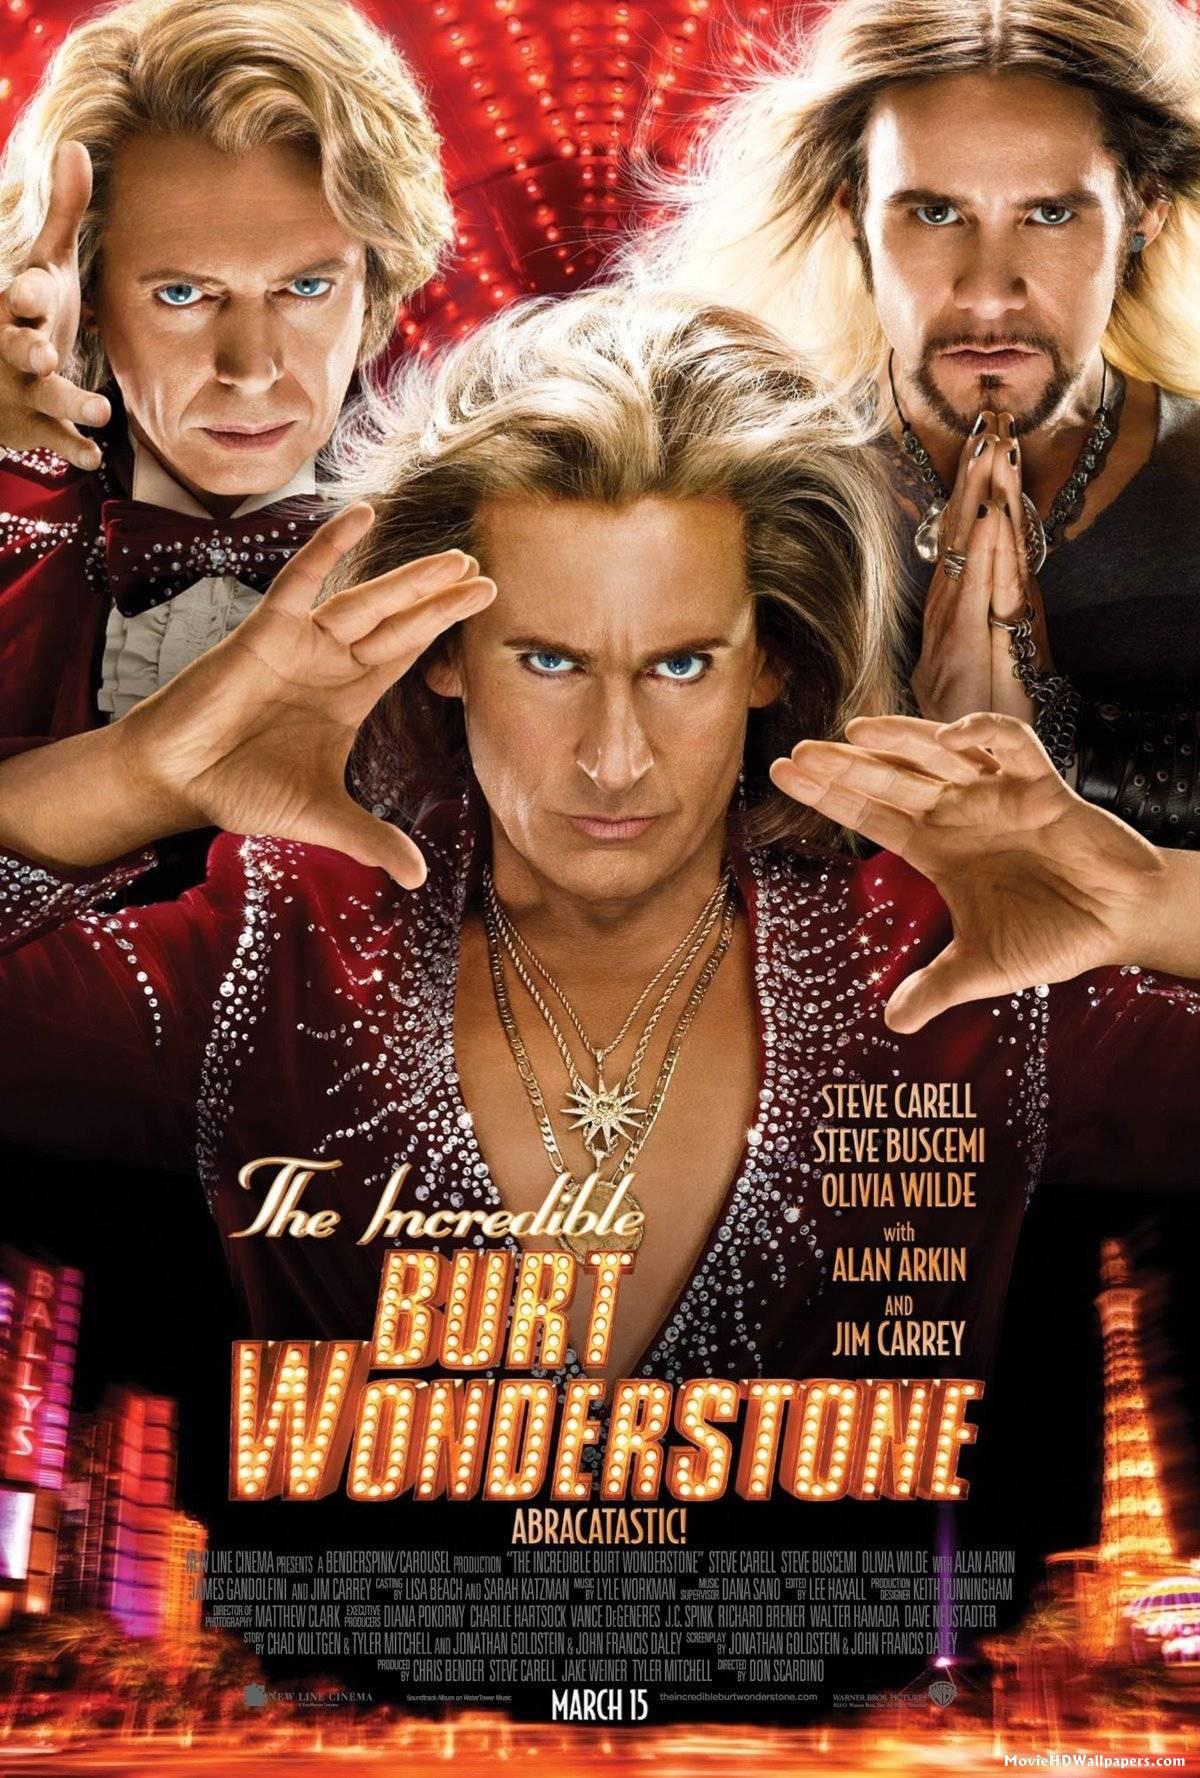 The Incredible Burt Wonderstone - Movie Poster #9 (Original)